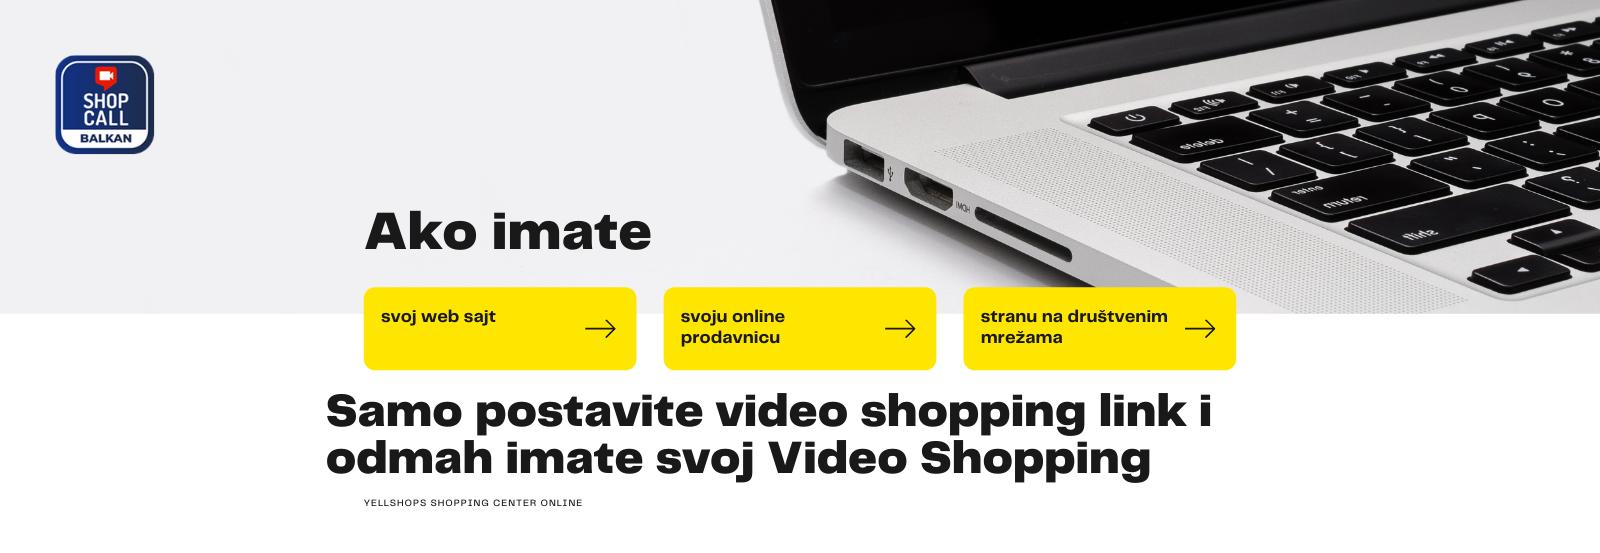 Video Shopping